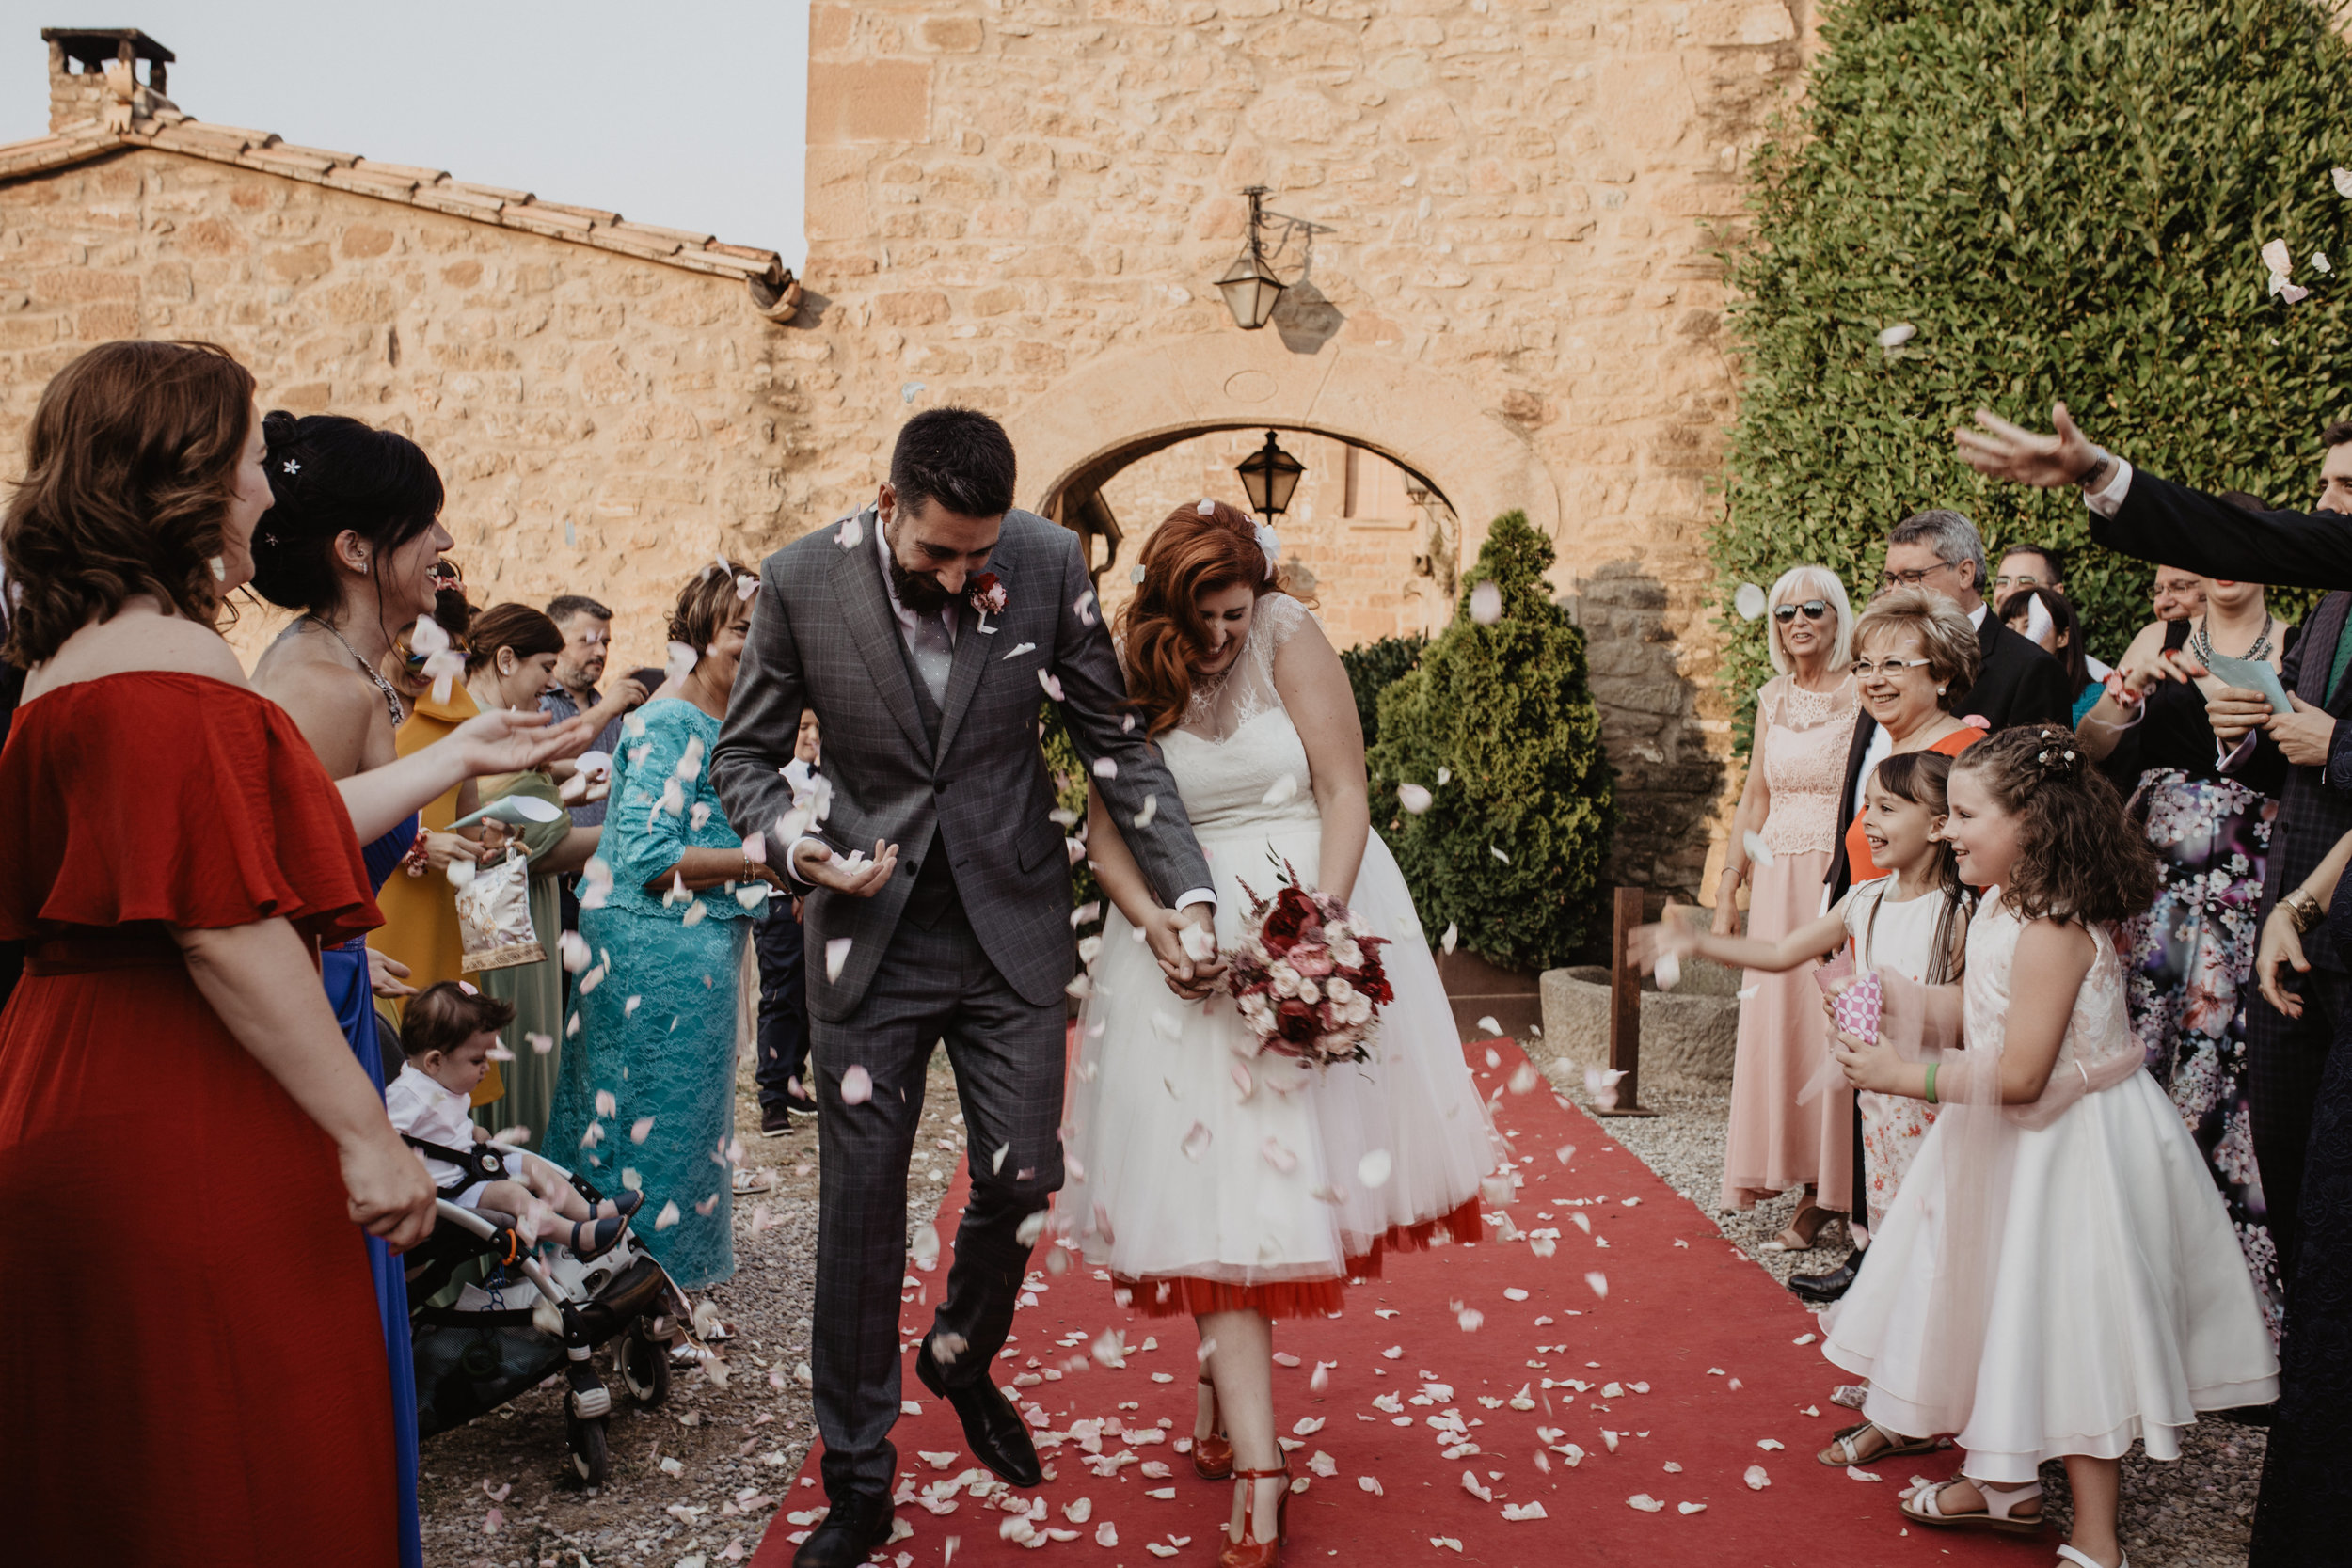 thenortherngirlphotography_photography_thenortherngirl_rebeccascabros_wedding_weddingphotography_masialagarrigadecastelladral_joaniemma_bodaenbarcelona_weddingphotographer_emmaijoan-520.jpg